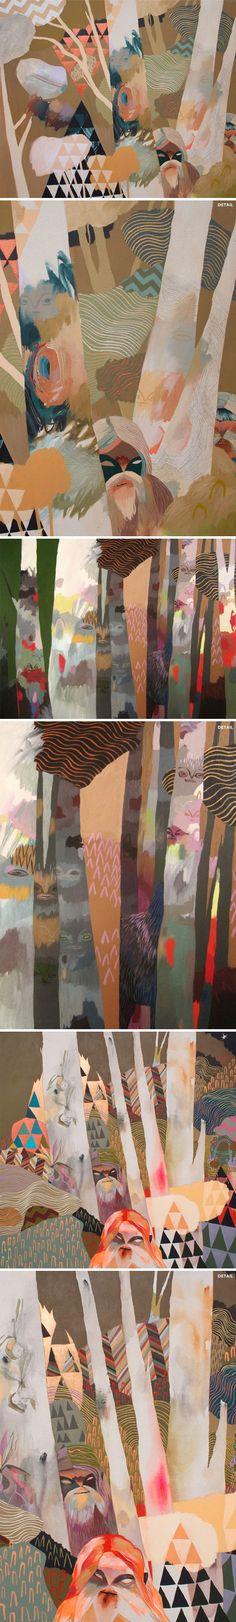 The Jealous Curator /// curated contemporary art /// megan hildebrand